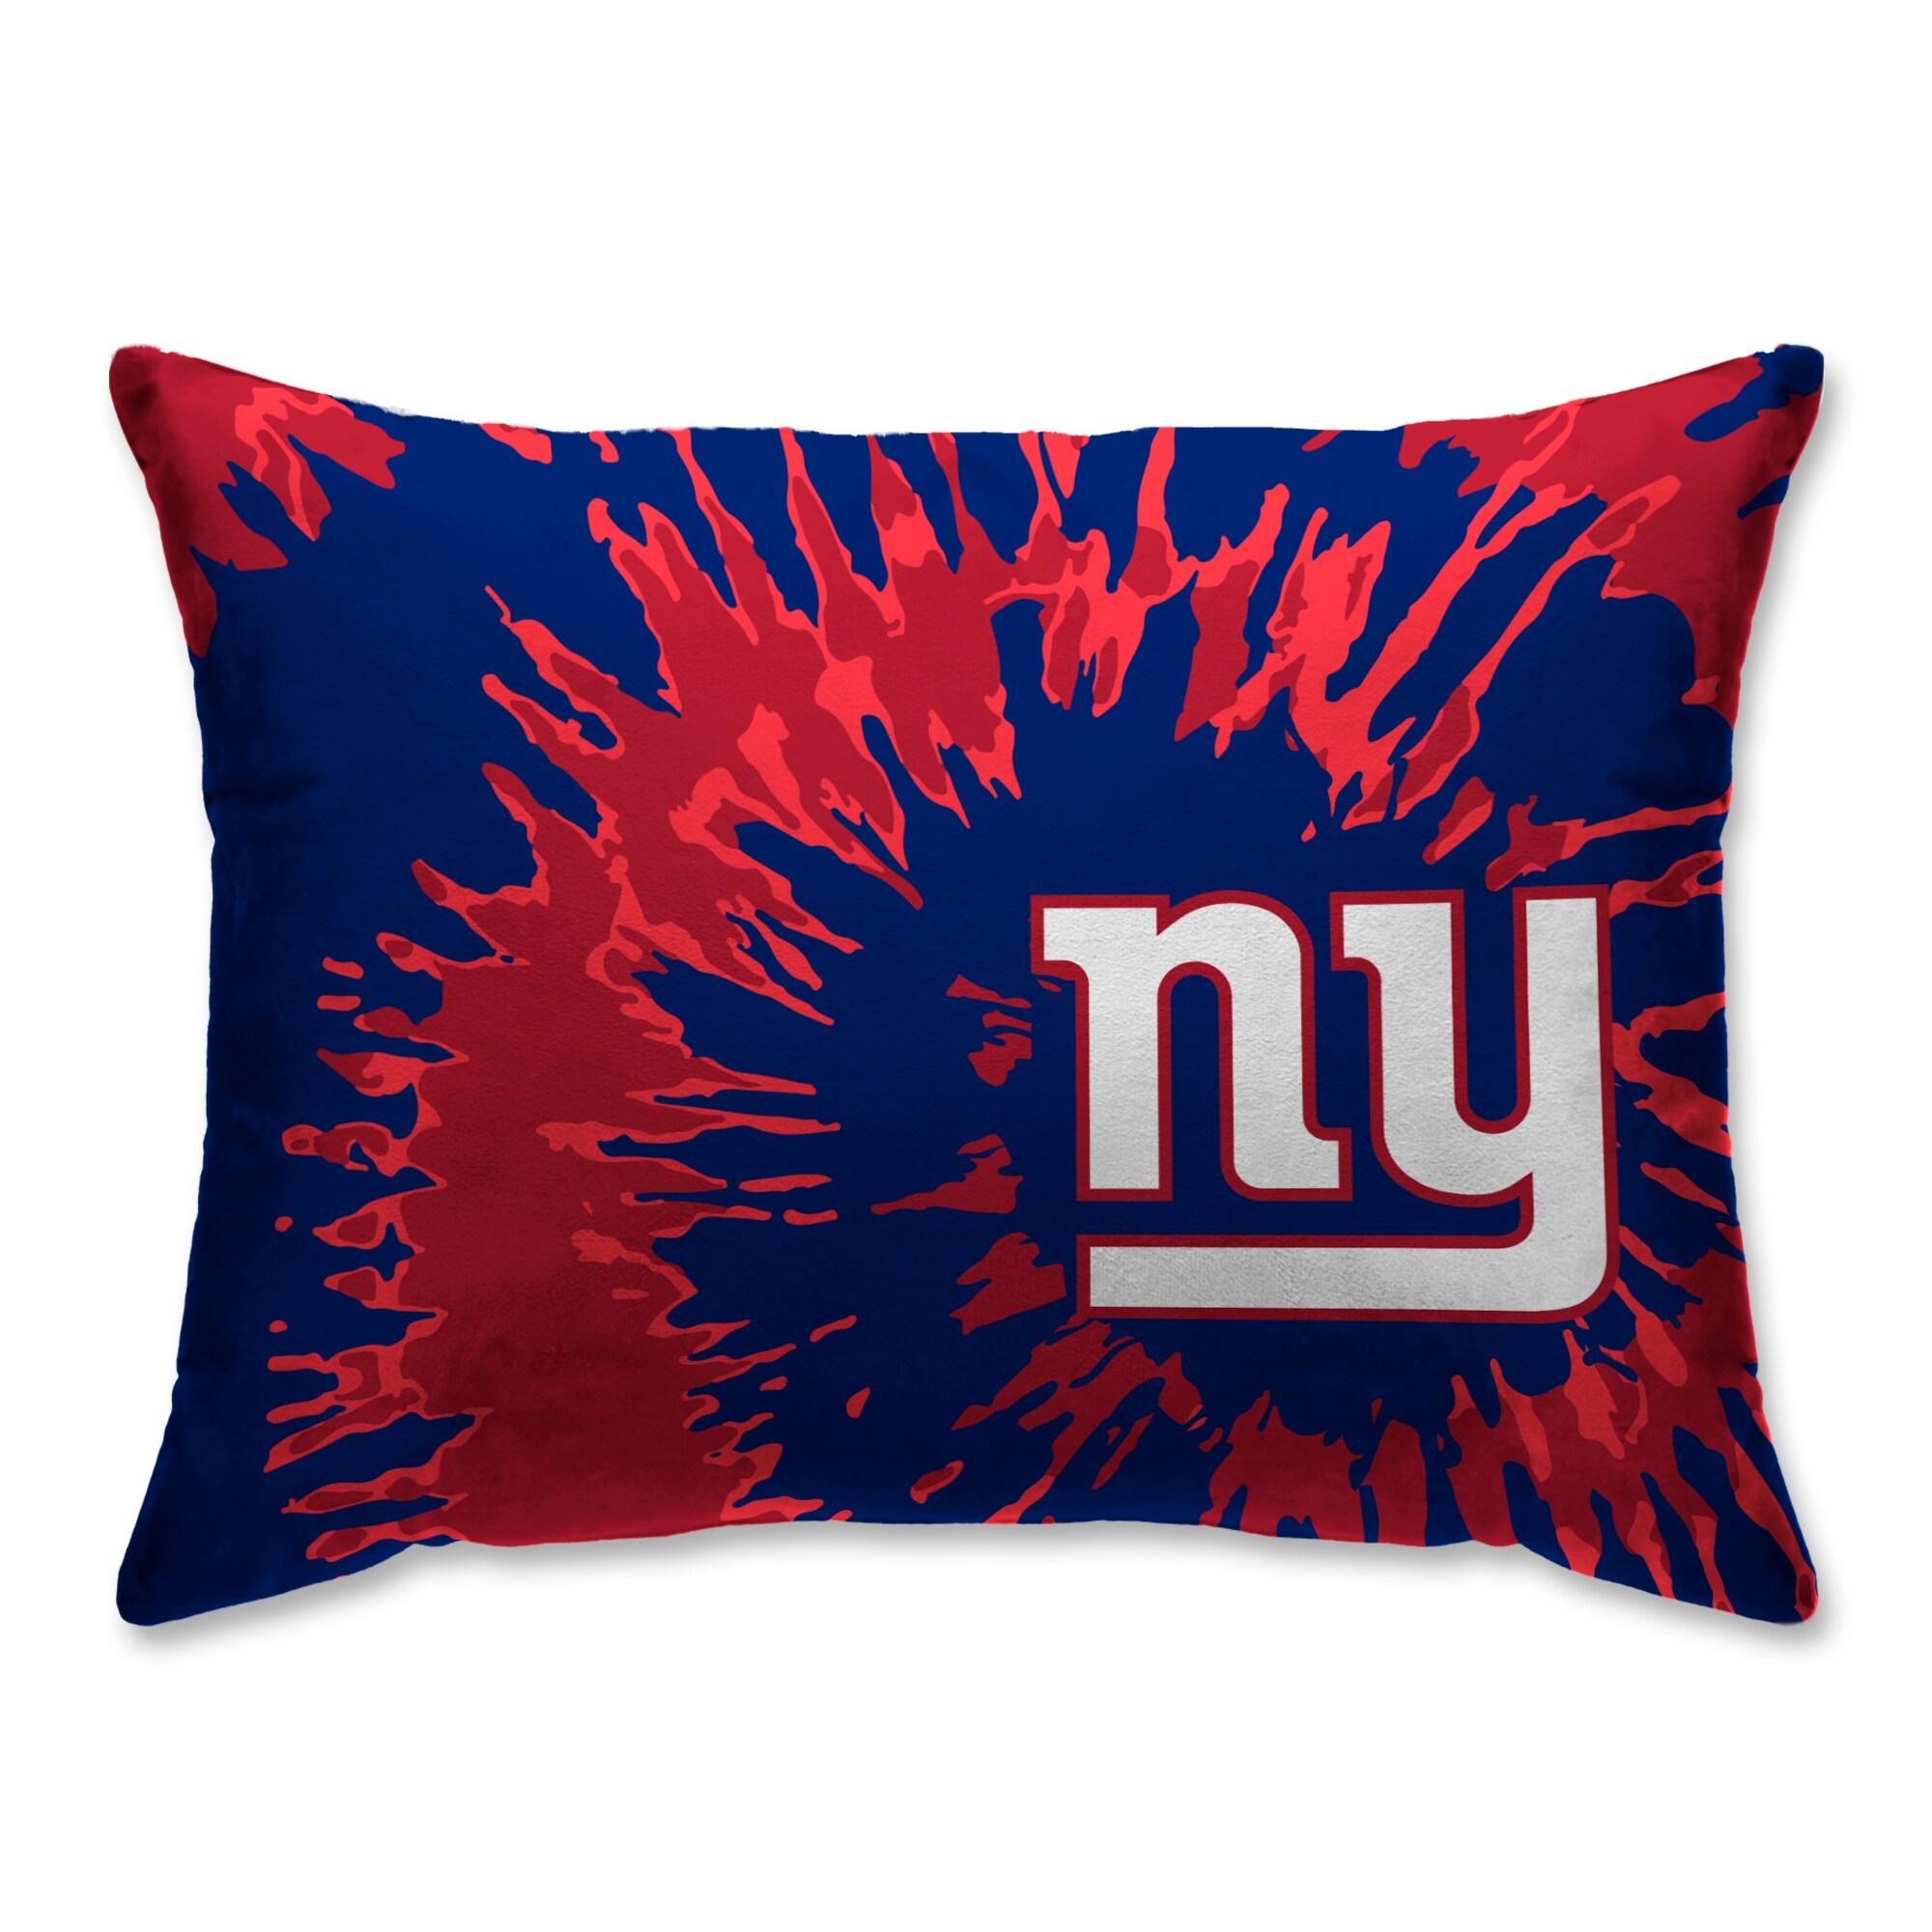 New York Giants Tie Dye Plush Bed Pillow - Blue